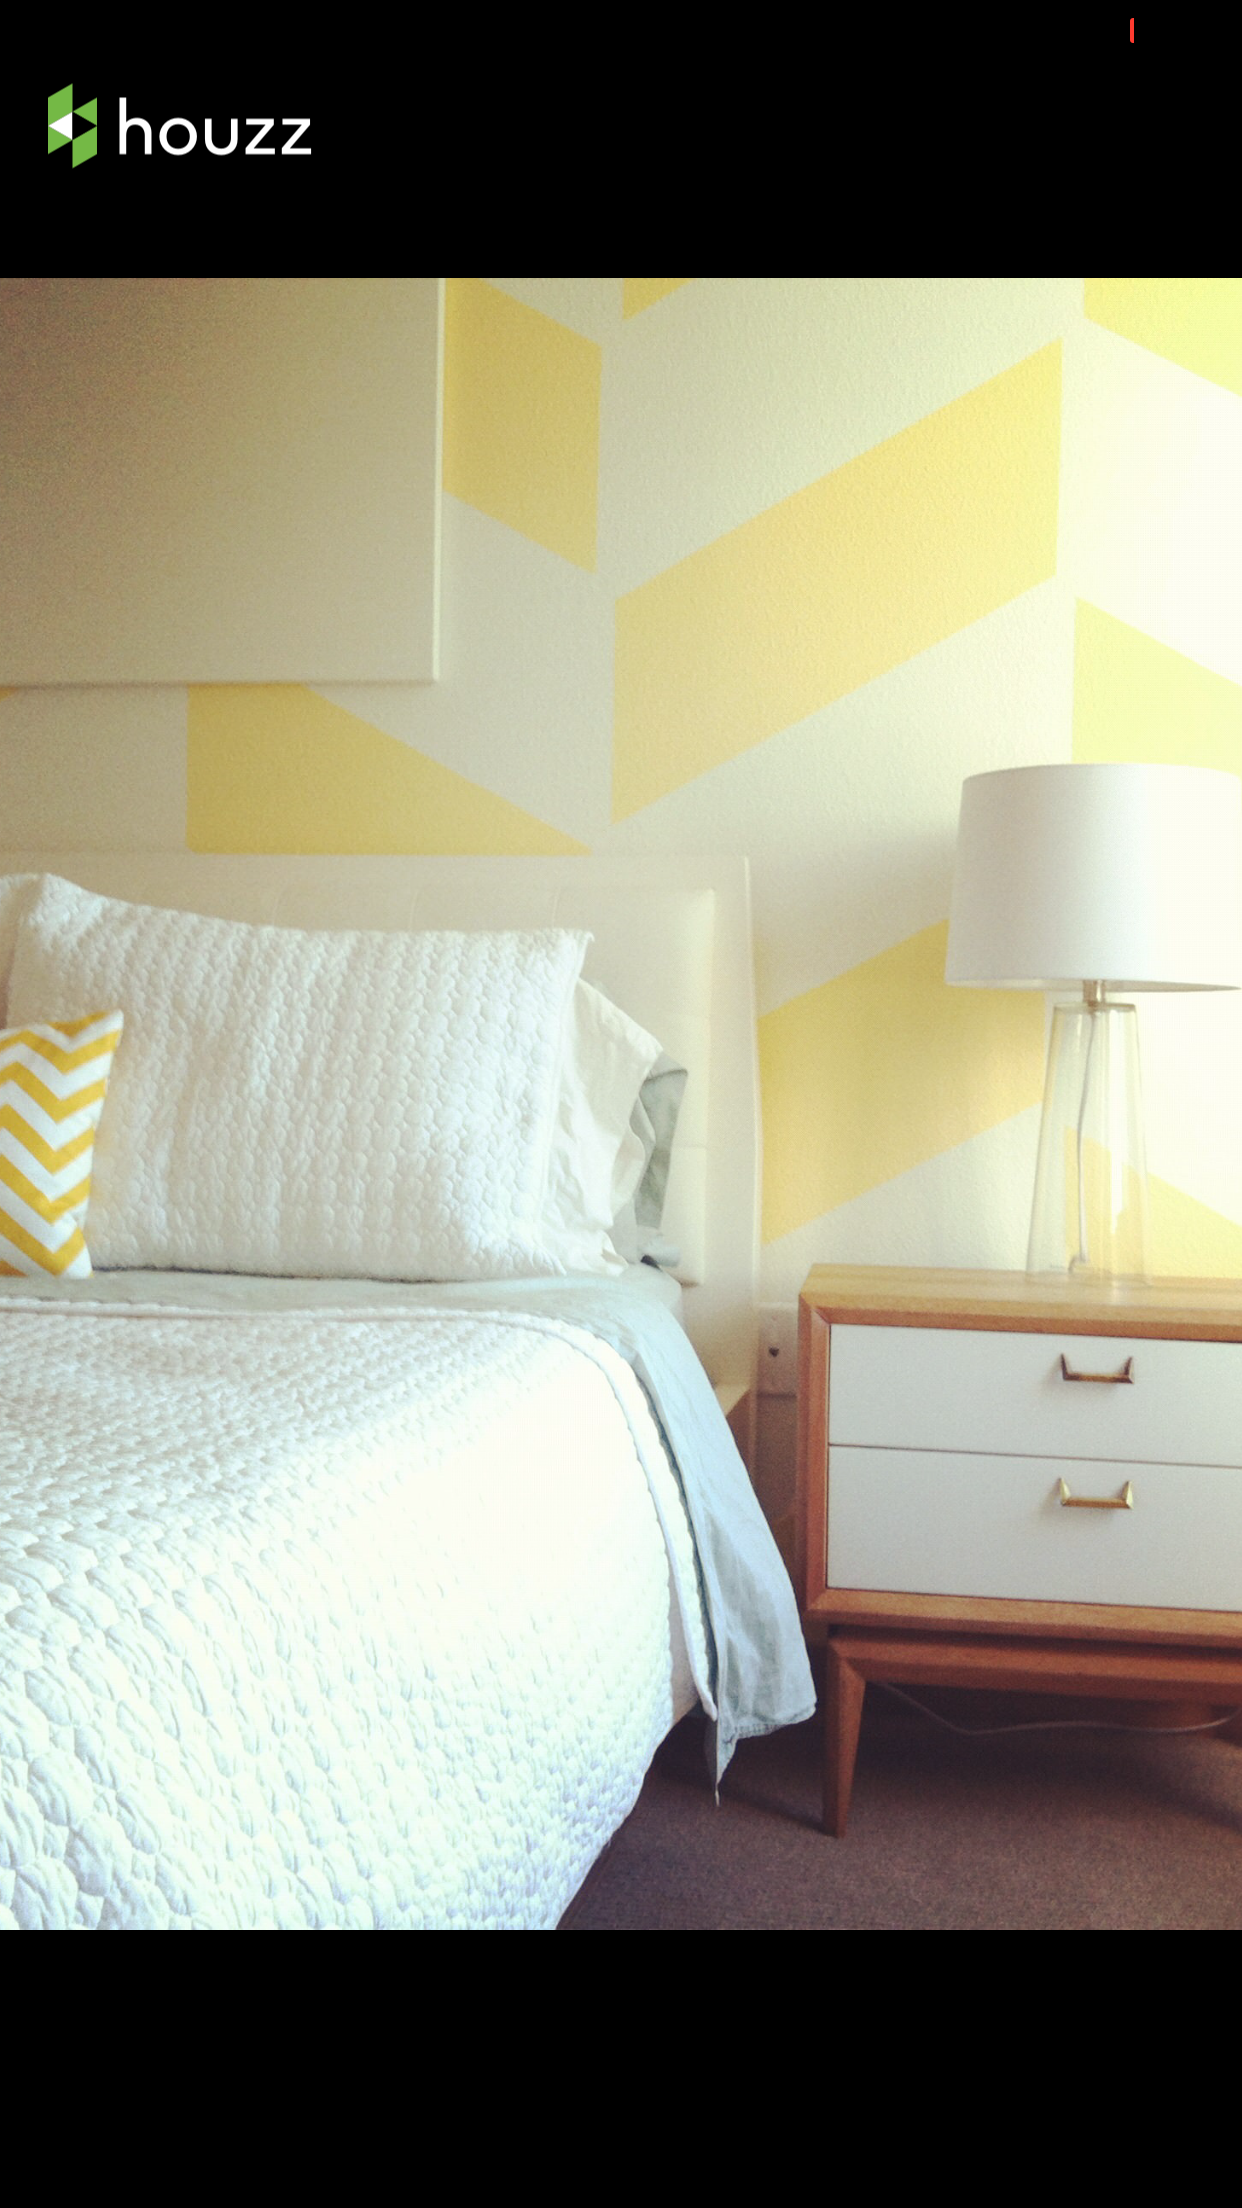 Pin by Stephanie Takacs on A• Bedroom Ideas   Pinterest   Wall ...